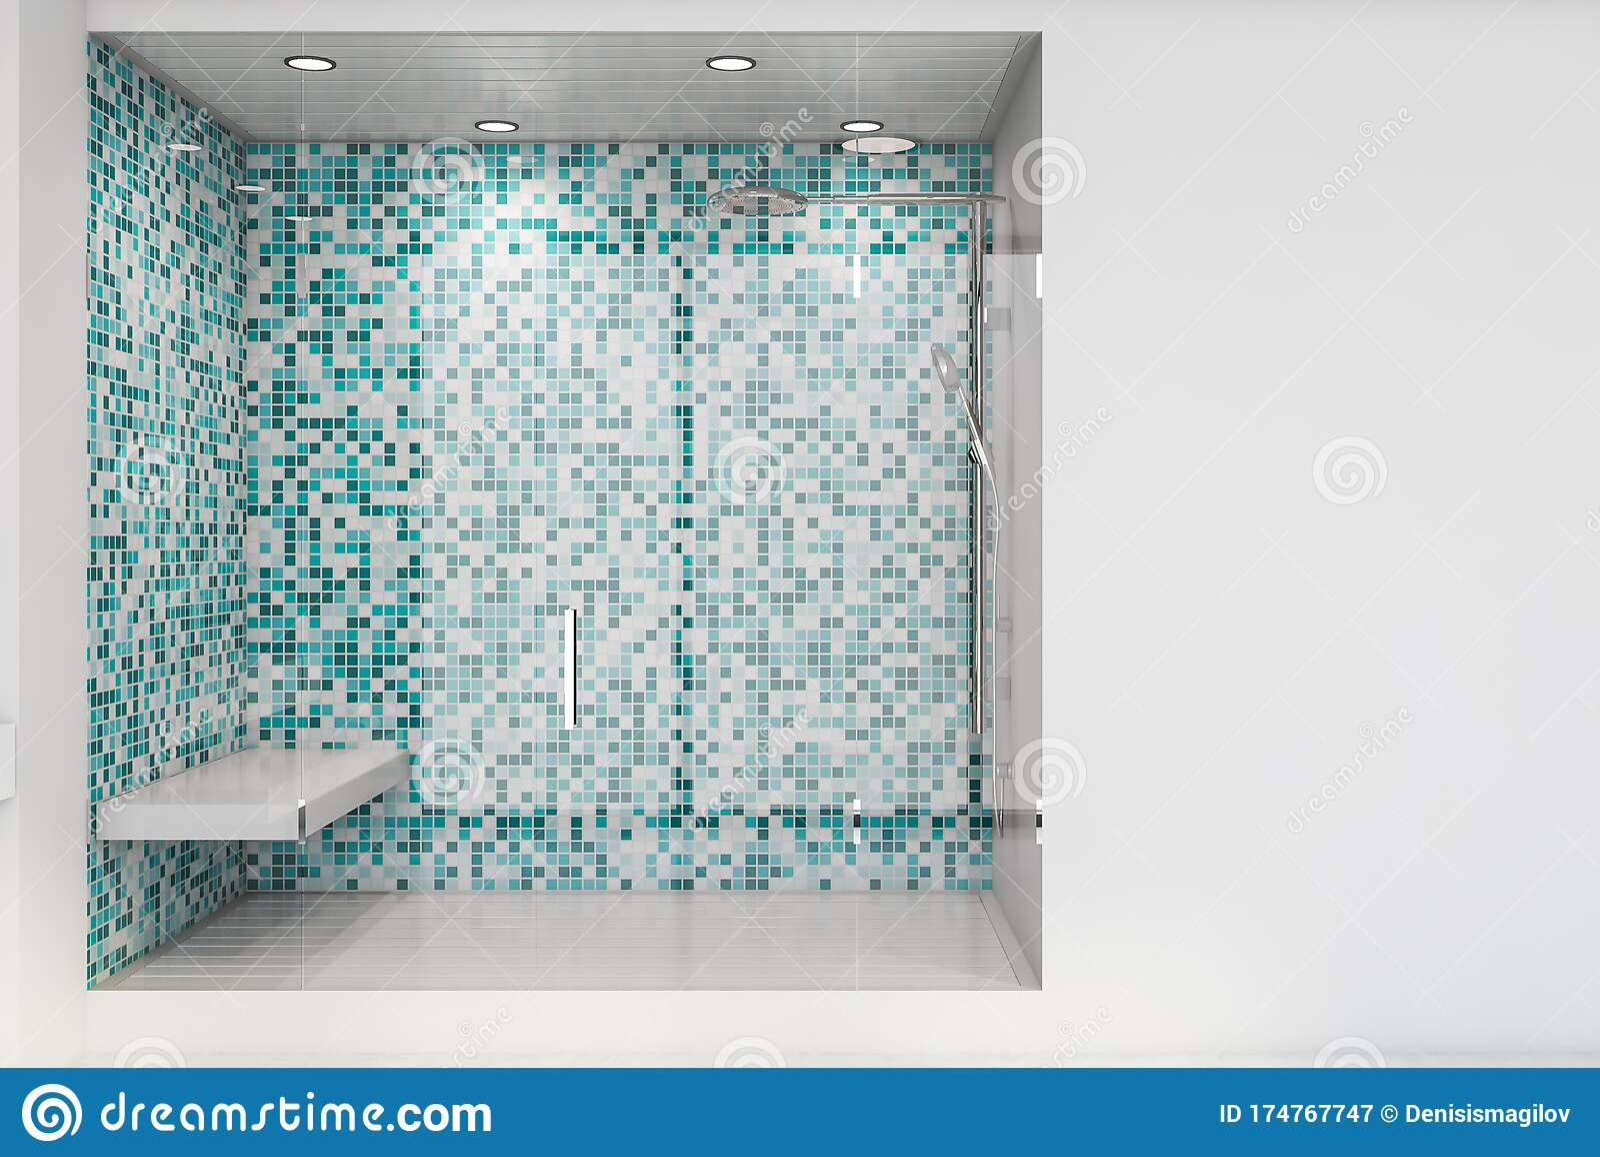 https www dreamstime com white blue tile shower stall interior modern bathroom tiled walls glass door comfortable bench concept spa d rendering image174767747